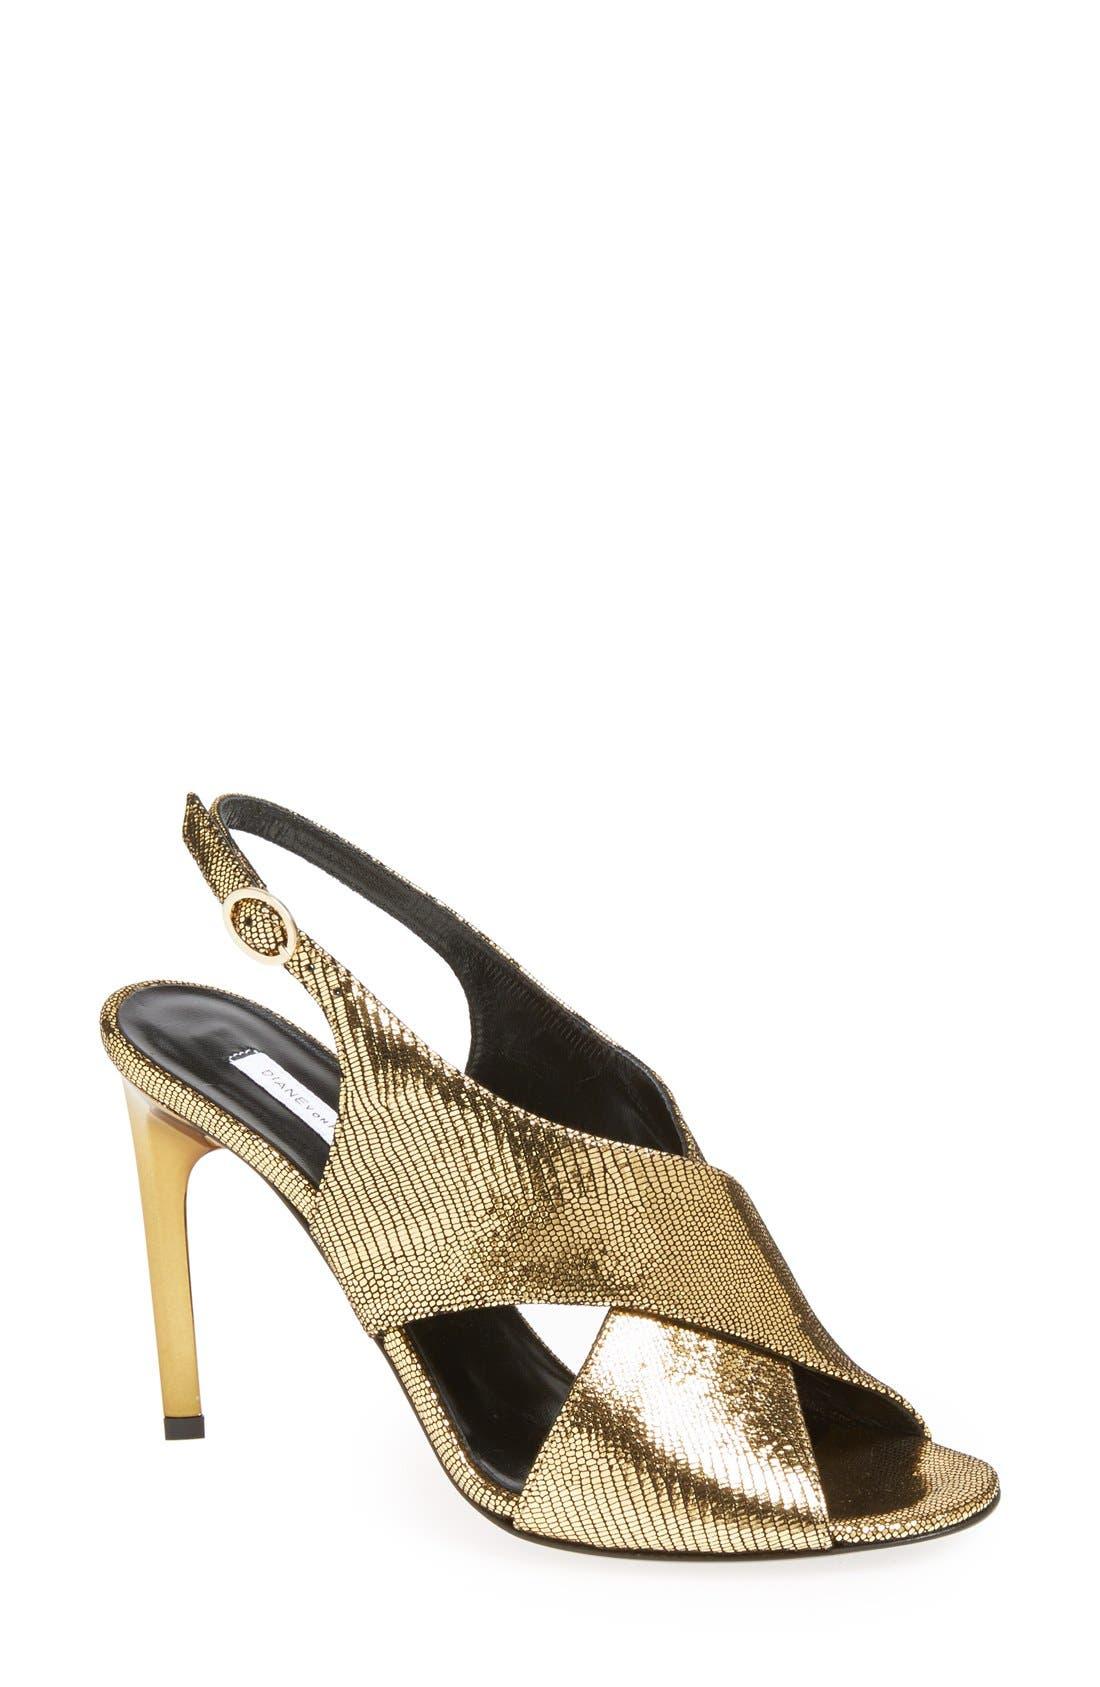 Alternate Image 1 Selected - Diane von Furstenberg 'Vick' Sandal (Women)